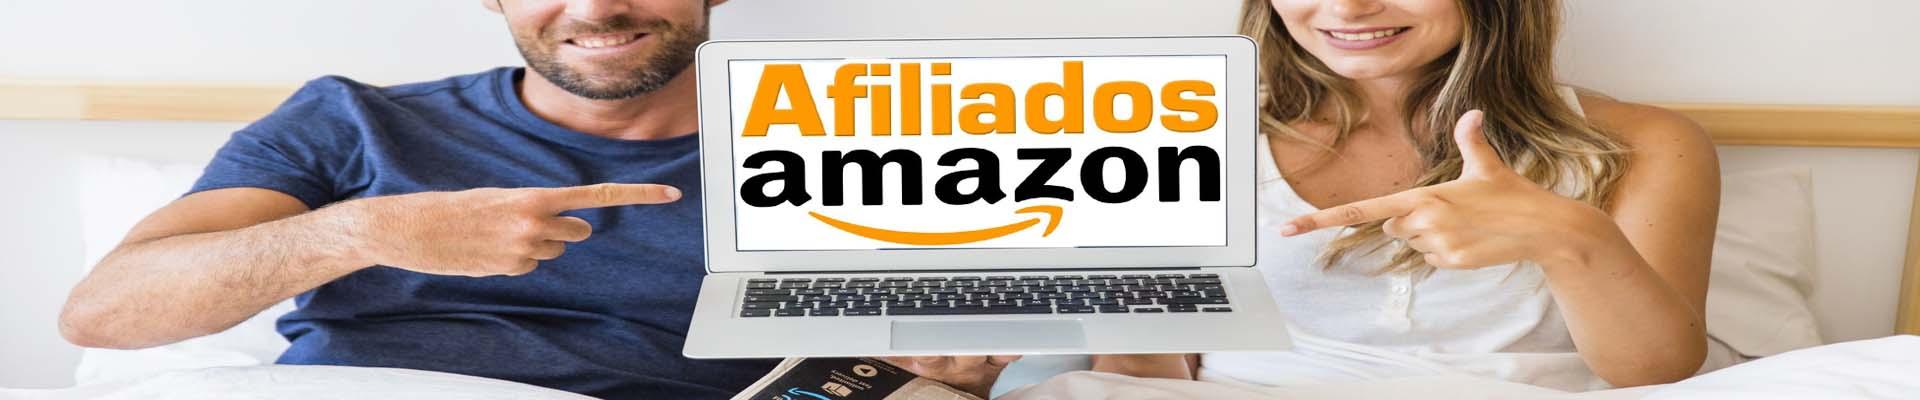 Diseño Web Freelance Valencia - Amazon Afiliados